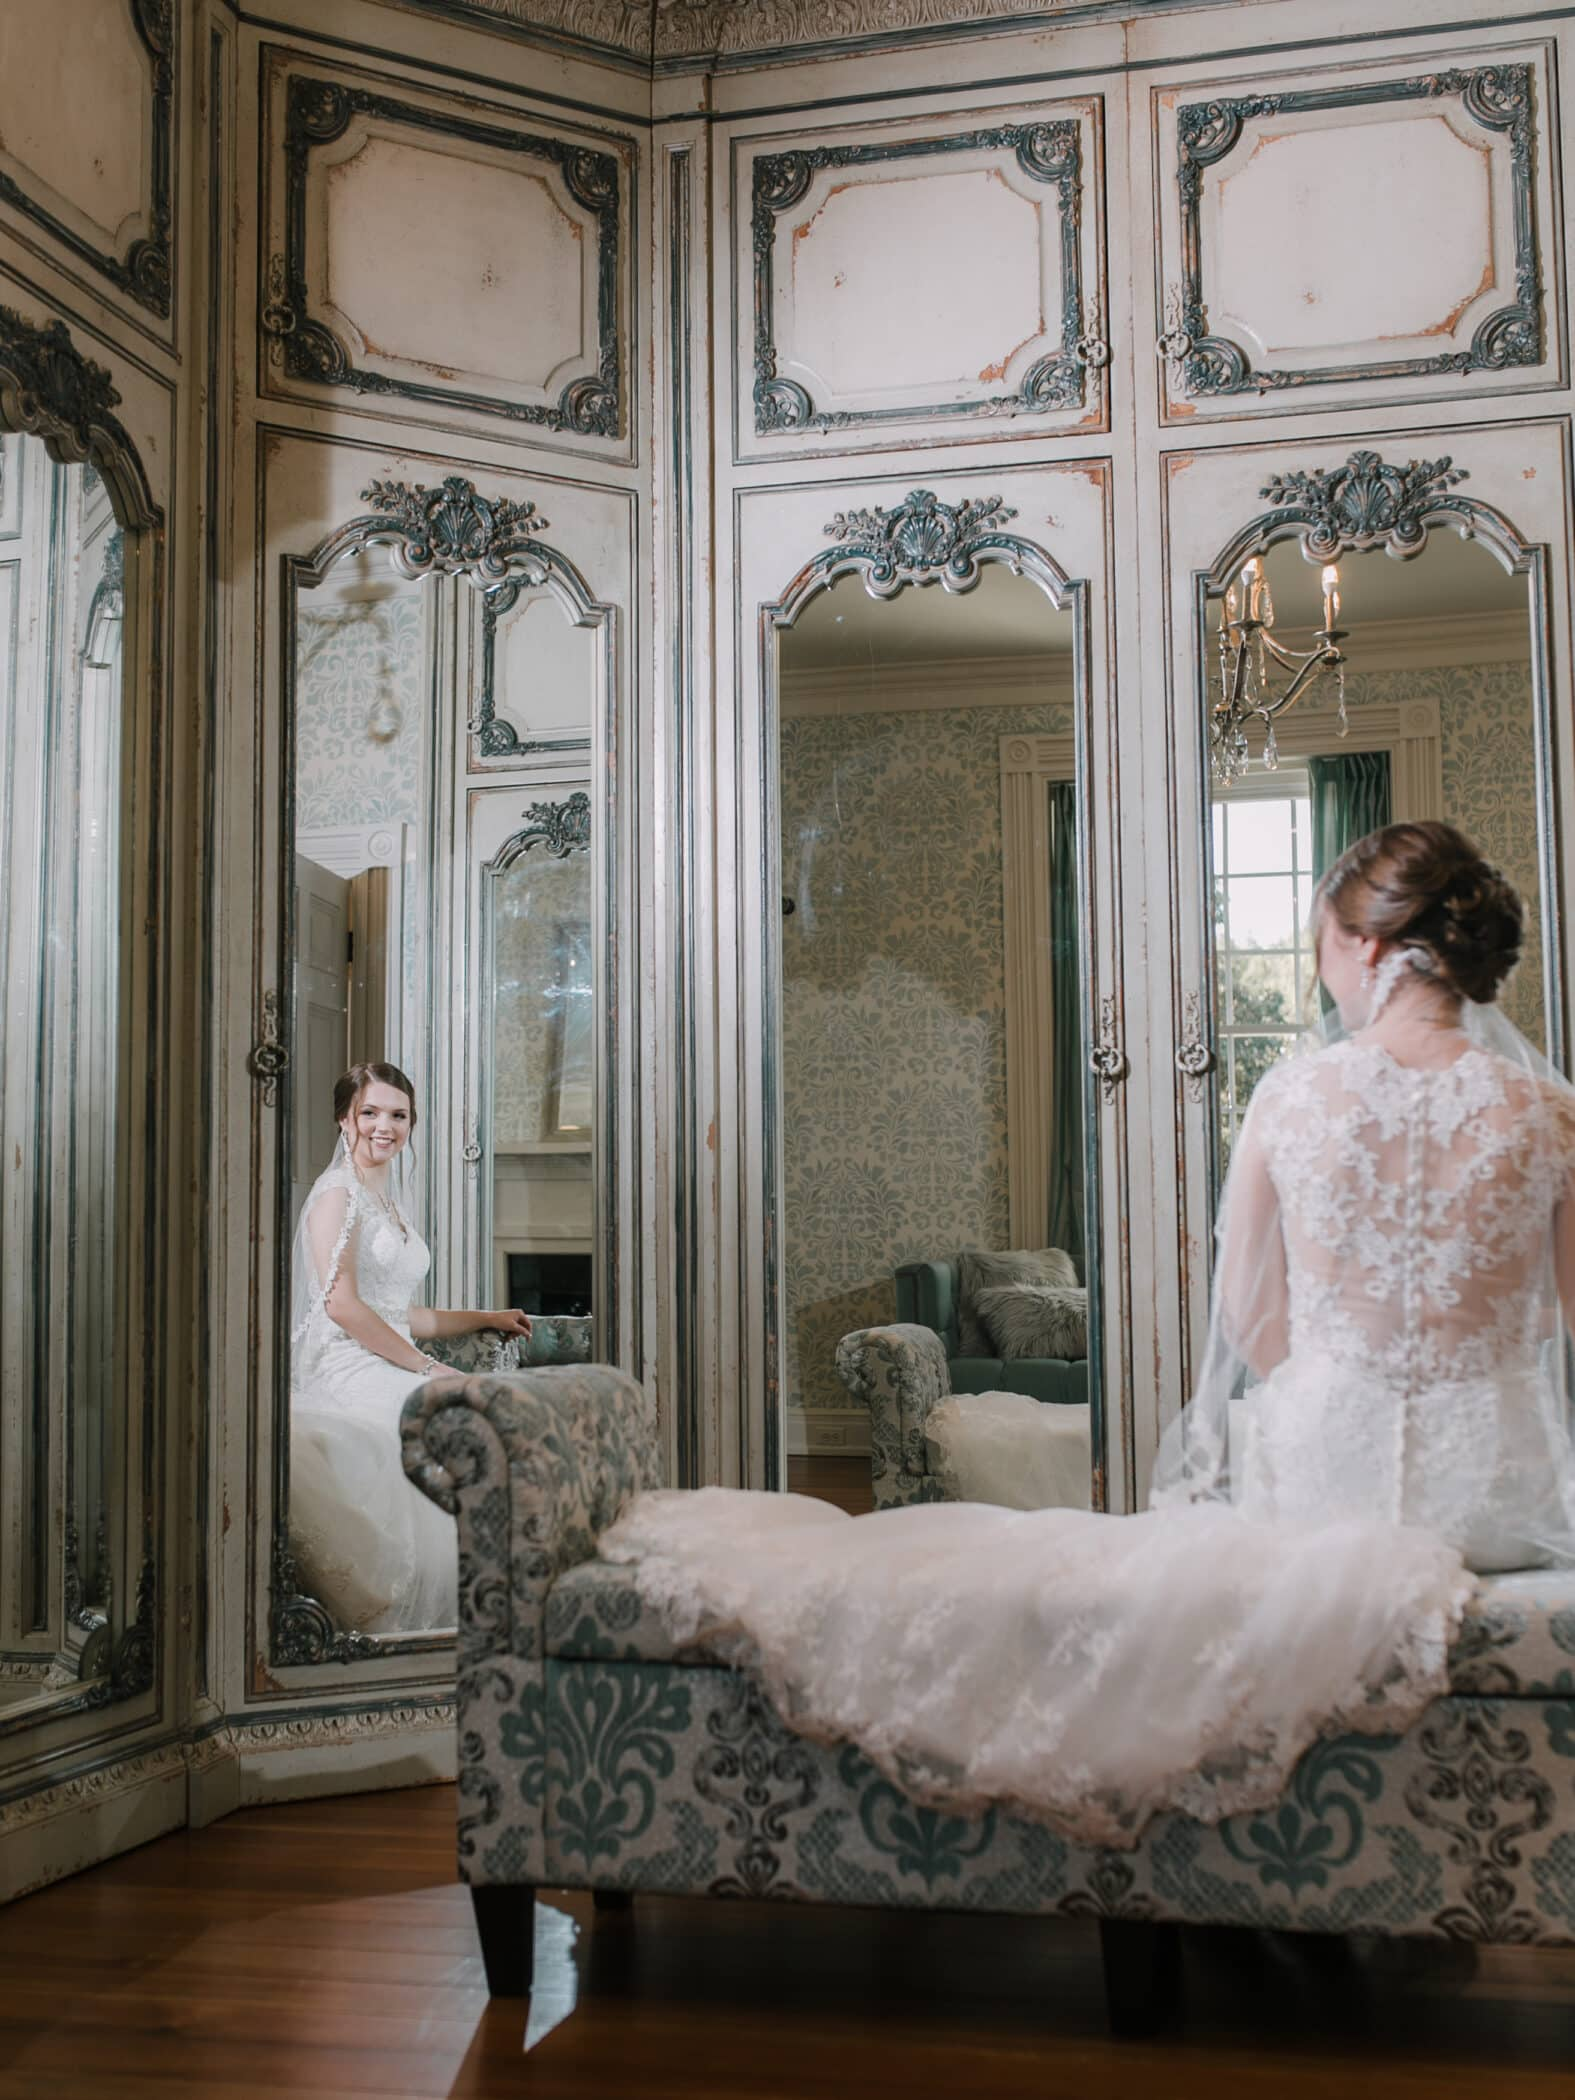 Selecting Your Virginia Wedding Venue | Entwined Events | Venue: Bella Rose Plantation in Lynchburg, VA | Photo Credit: April B Photography